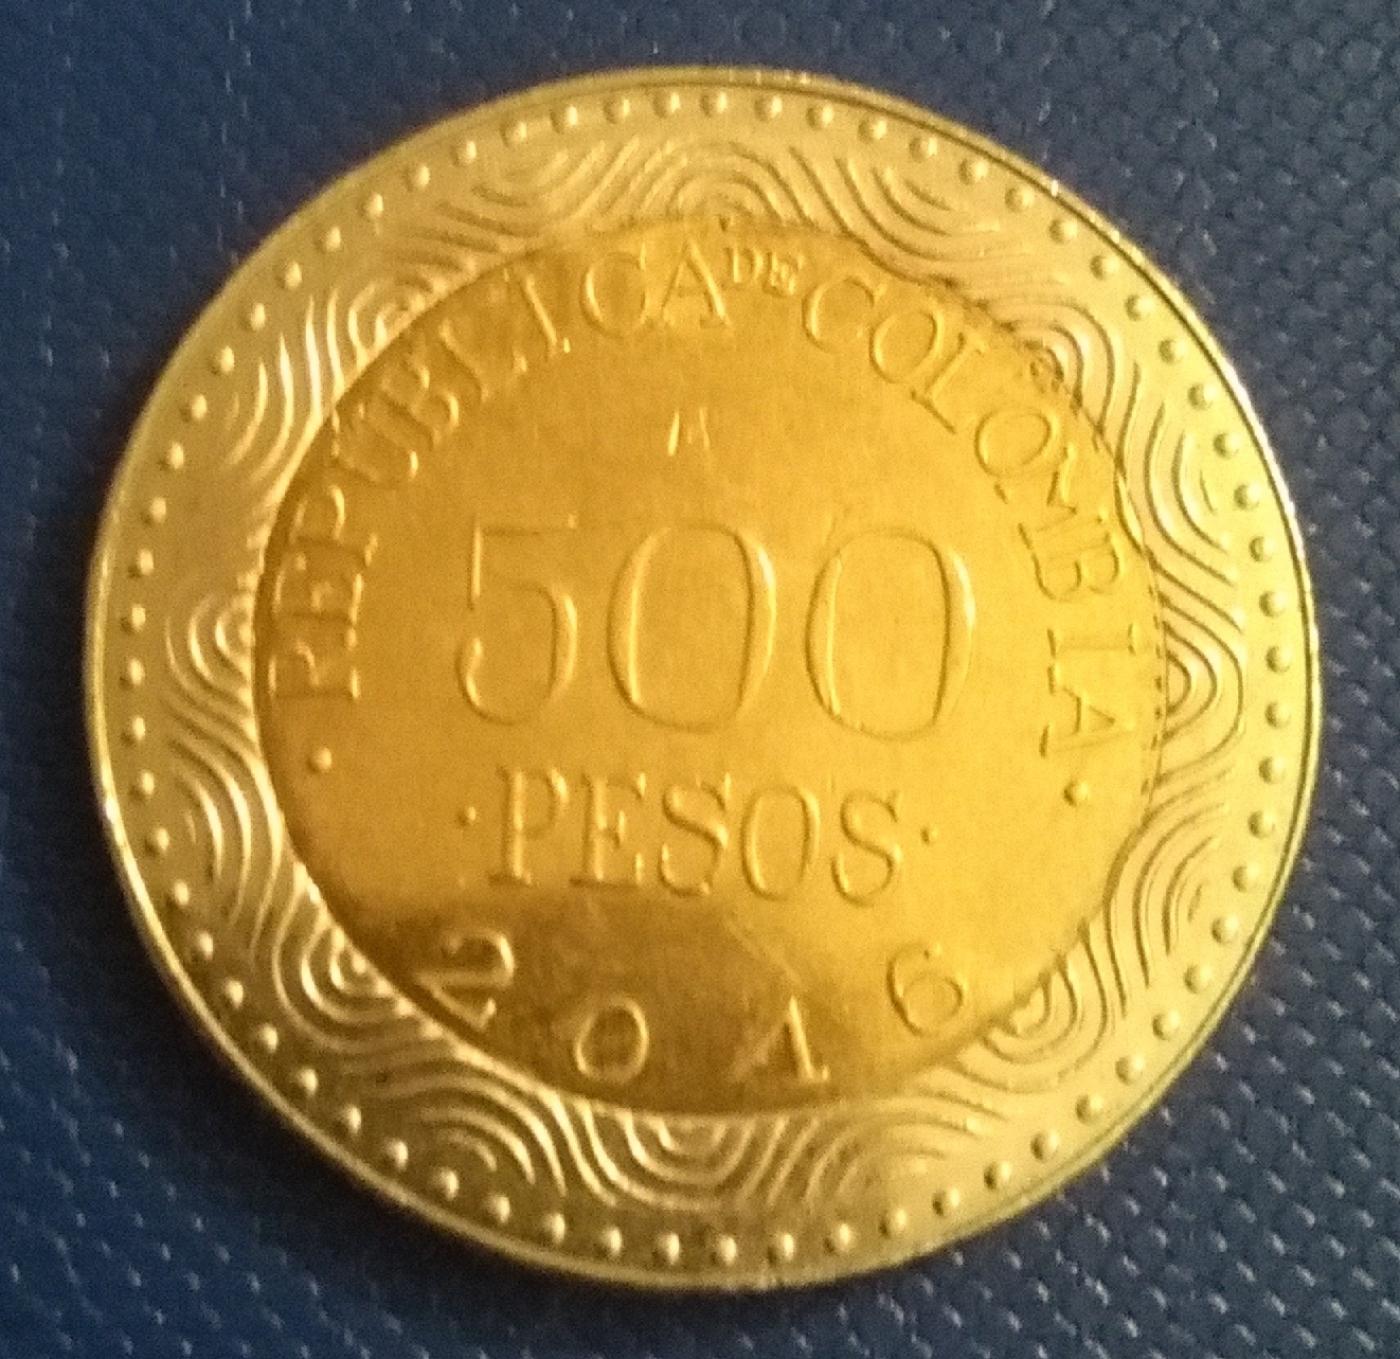 500 Pesos 2016